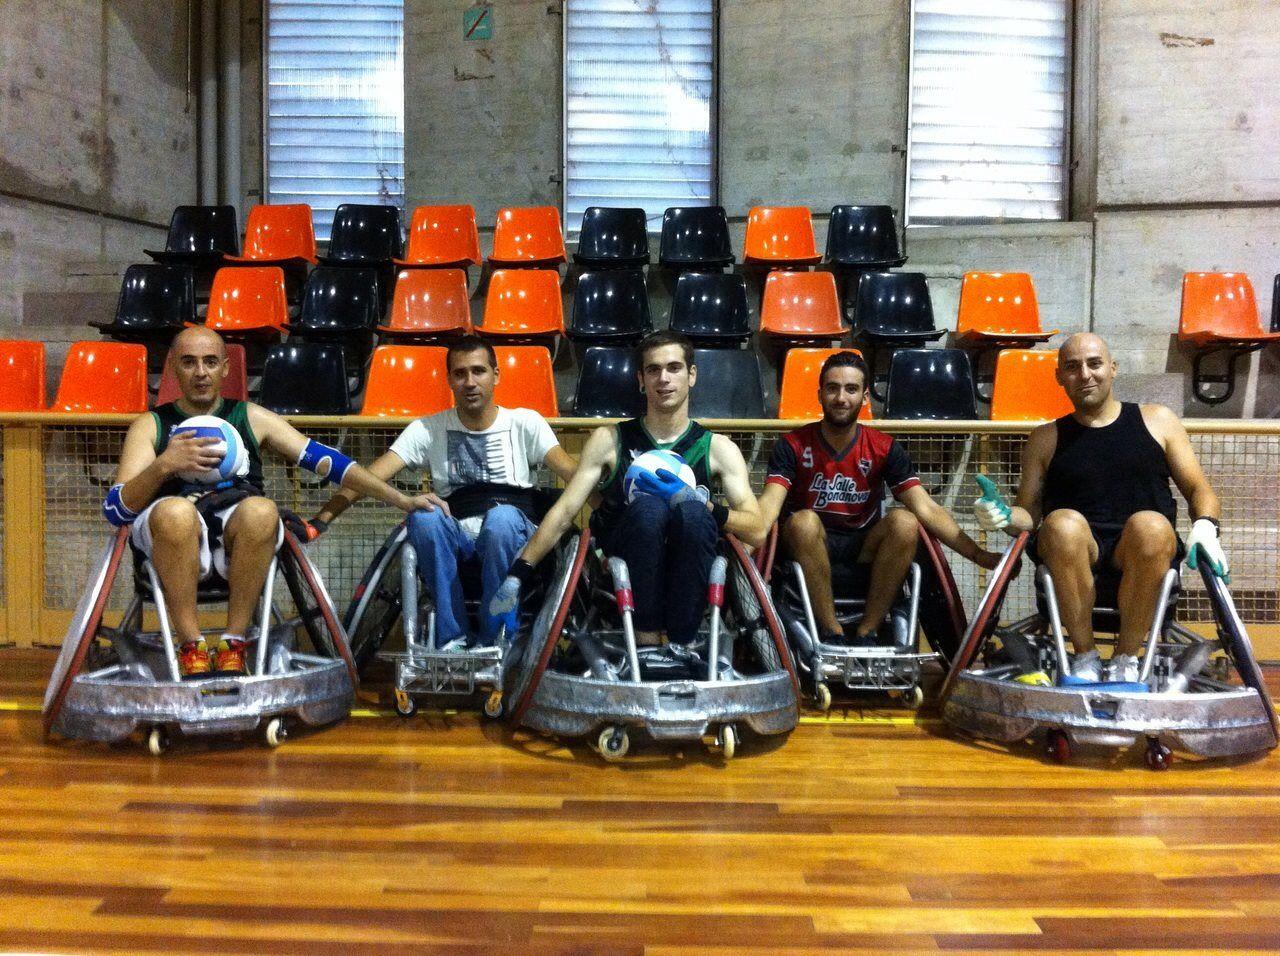 BatecLifestyle Quad Rugby, a sport for quadriplegics